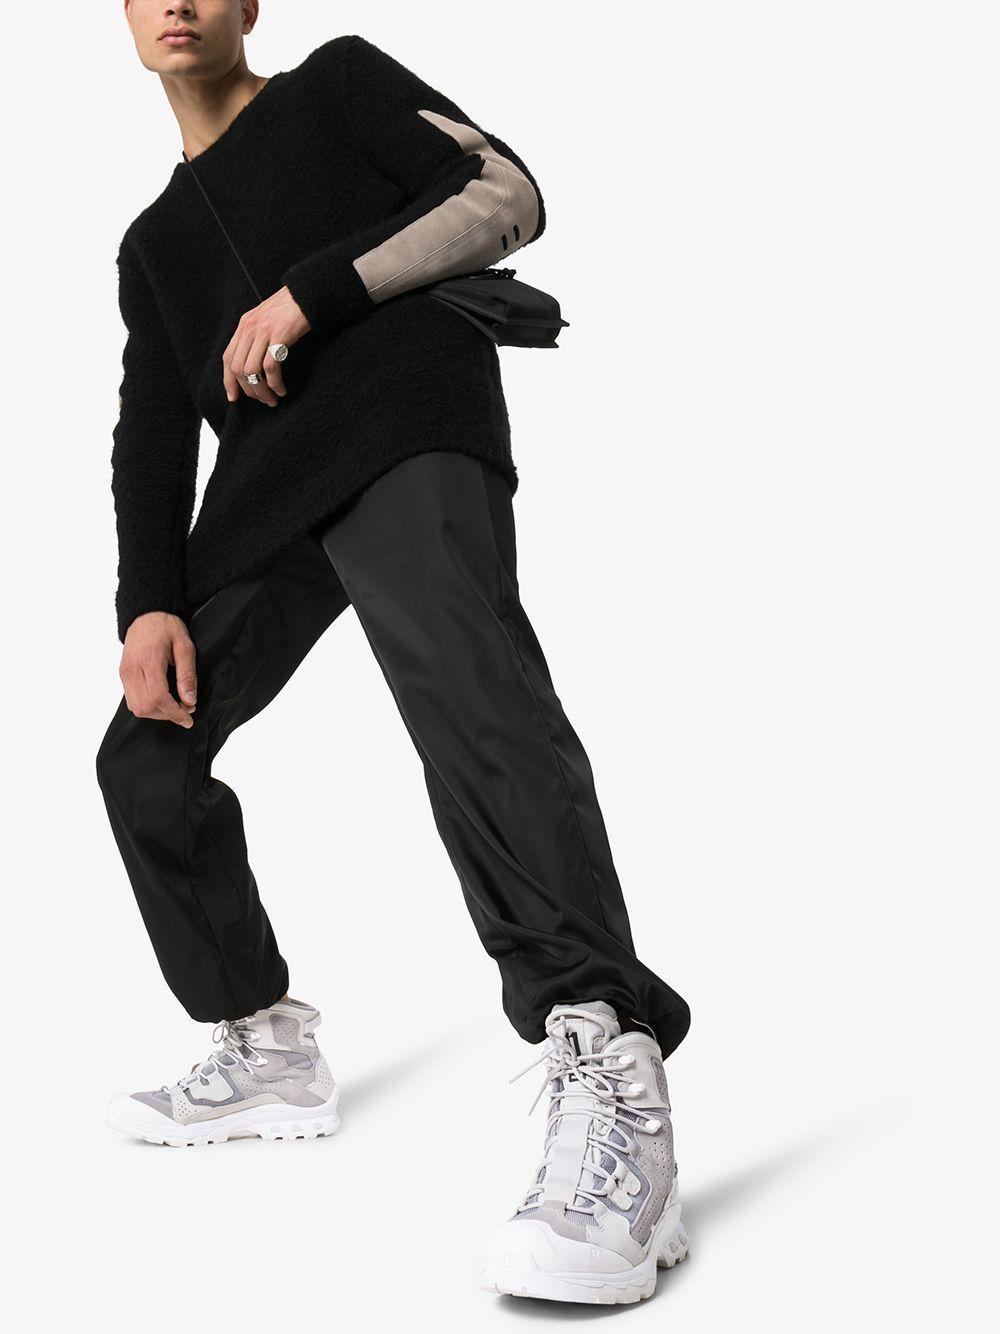 Botas tipo zapatilla Slab Boot 2 GTX Boris Bidjan Saberi de hombre de color Gris